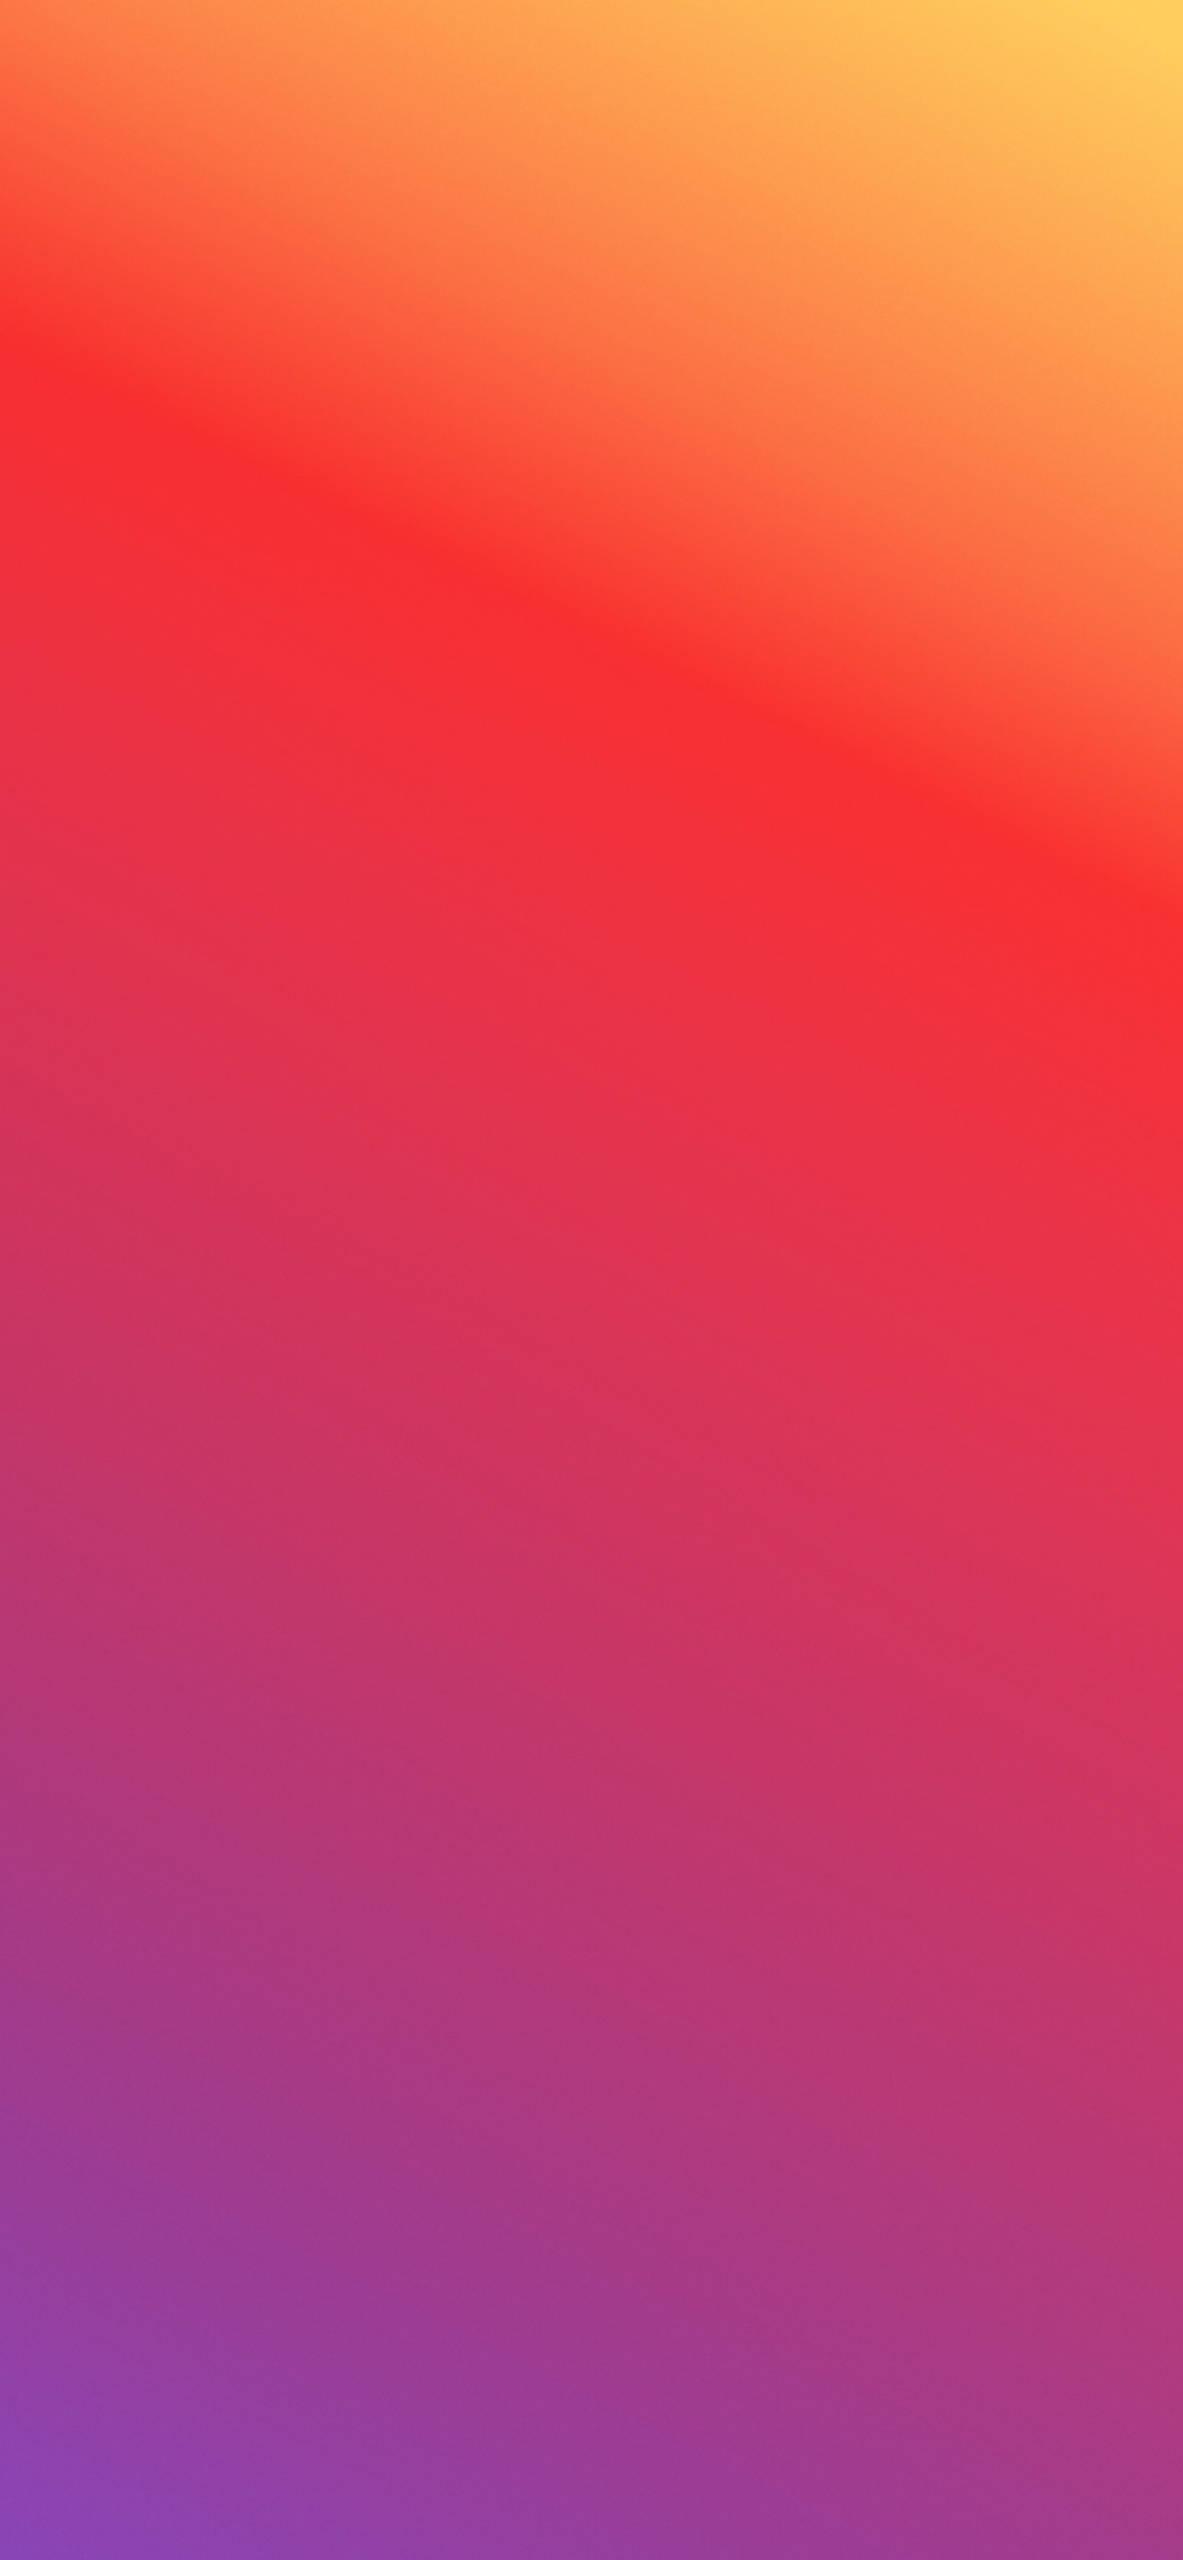 iPhone wallpapers gradient colors orange red Gradient Colors